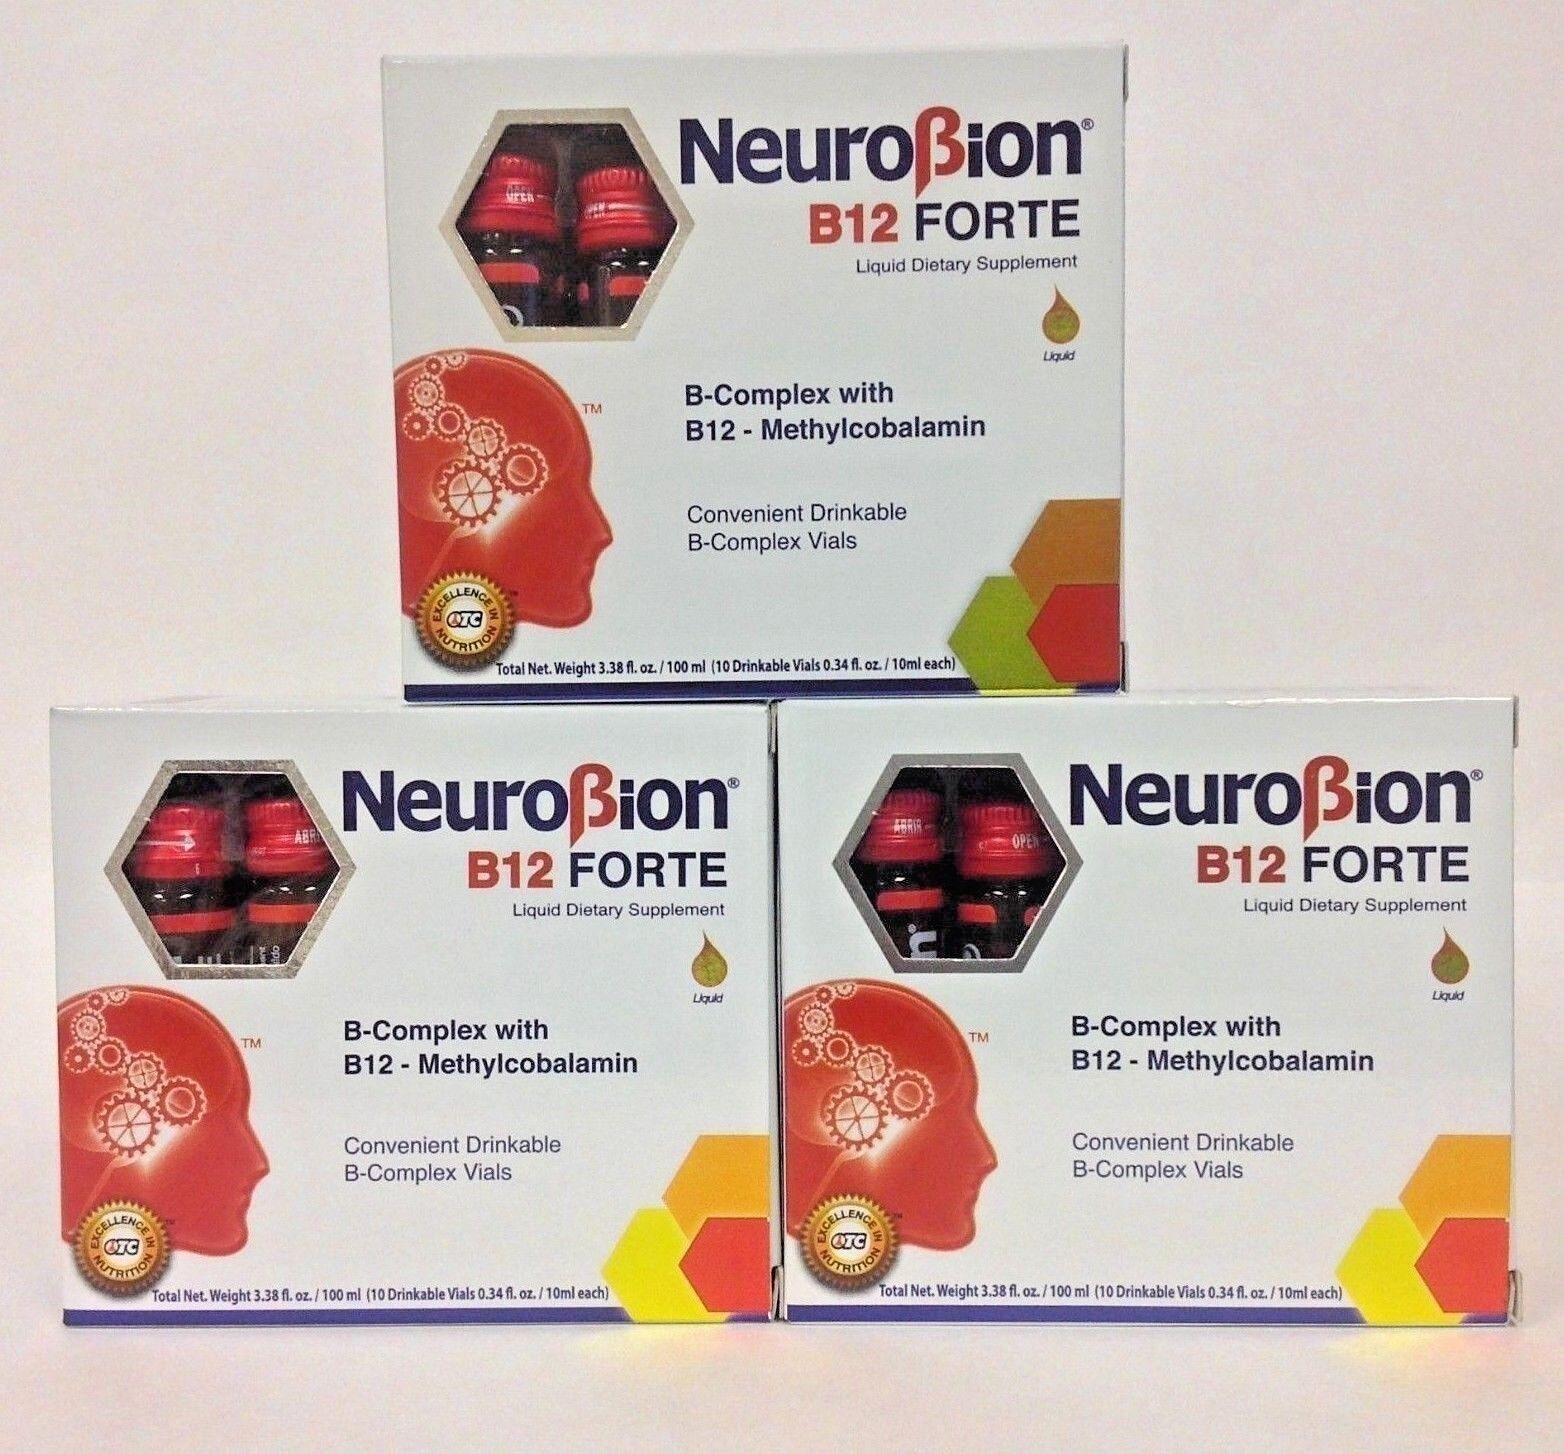 3 NEUROBION B12 FORTE SUPPLEMENT 10 Drinkable Vials / SUPLEMENTO BEBIBLE